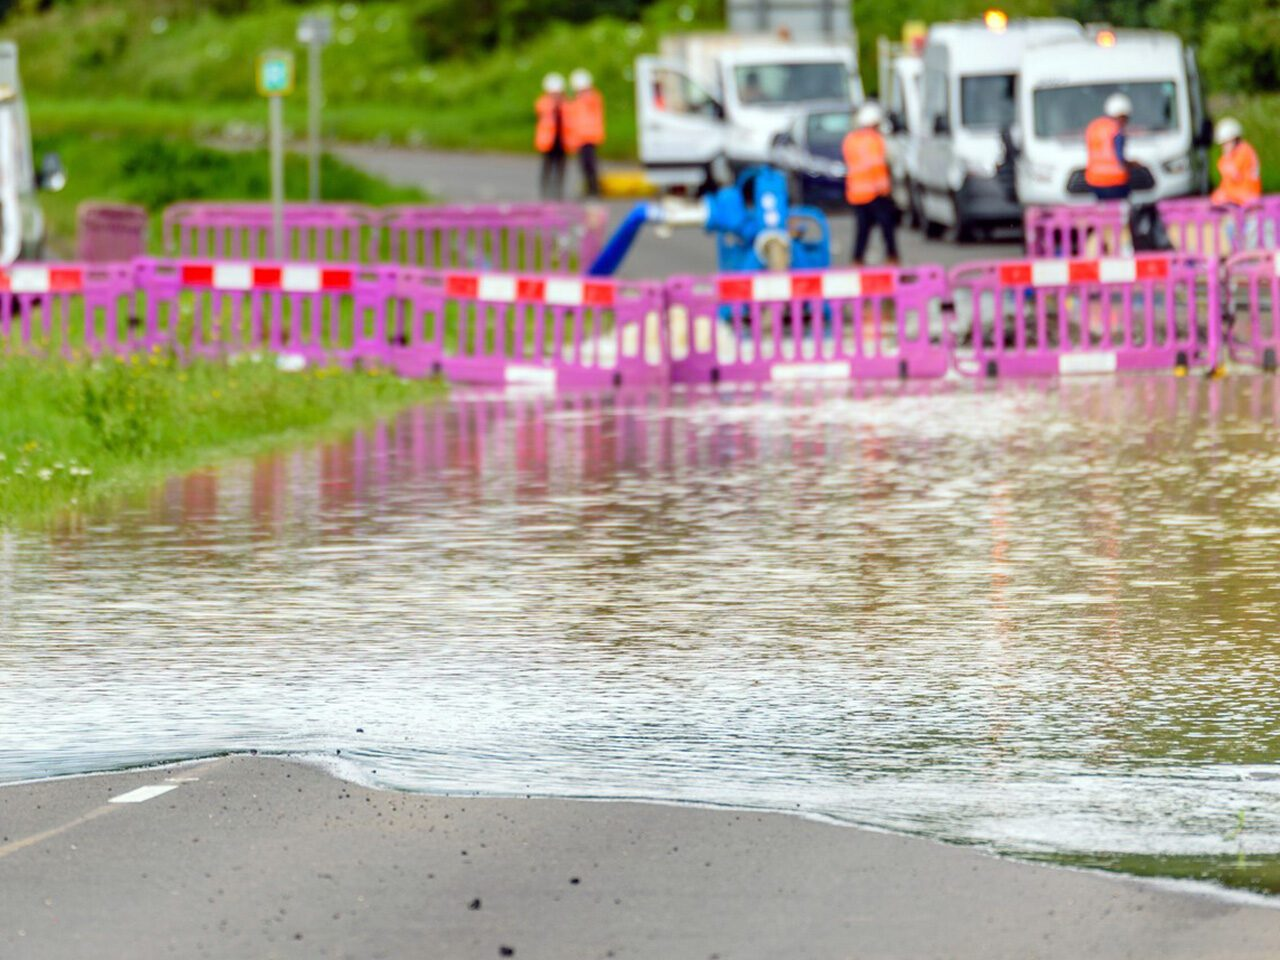 https://www.rwbgroup.co.uk/wp-content/uploads/2021/10/Flood-Response-Services-1280x960.jpg